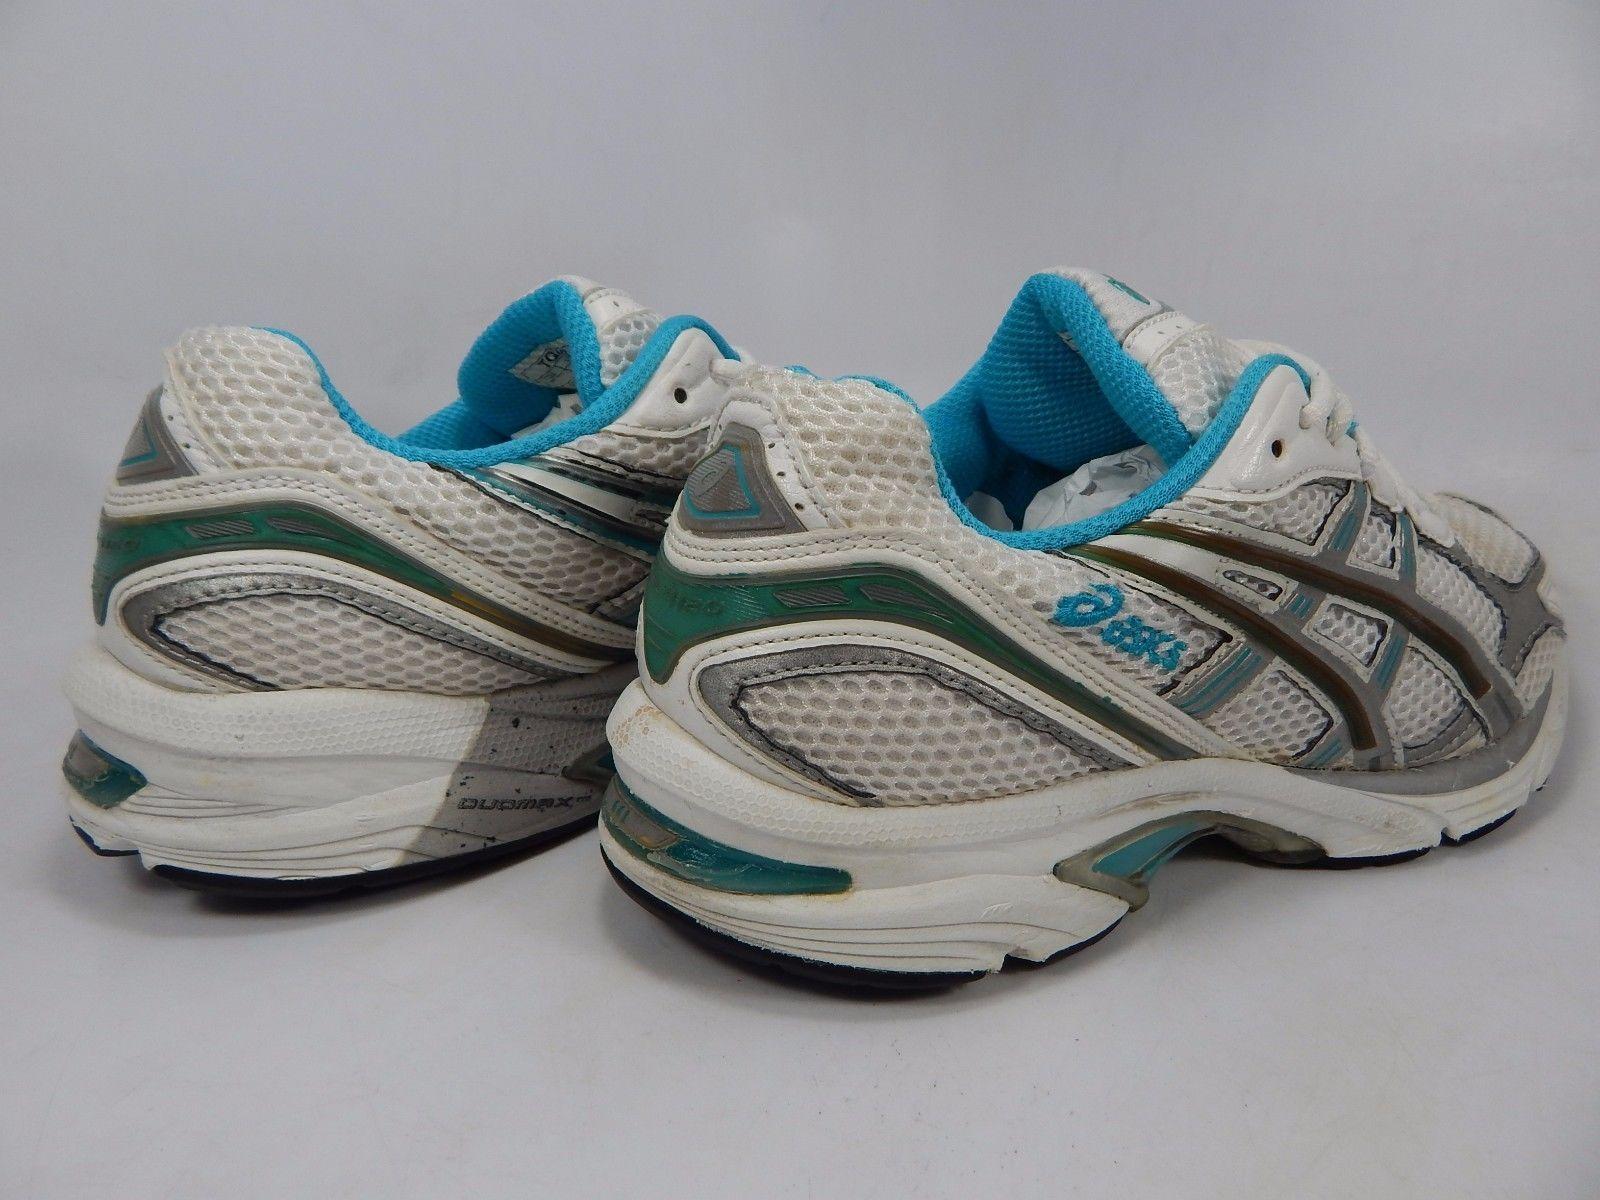 Asics Gel 1120 Women's Running Shoes Size US 9 M (B) EU 40.5 White Blue TQ762